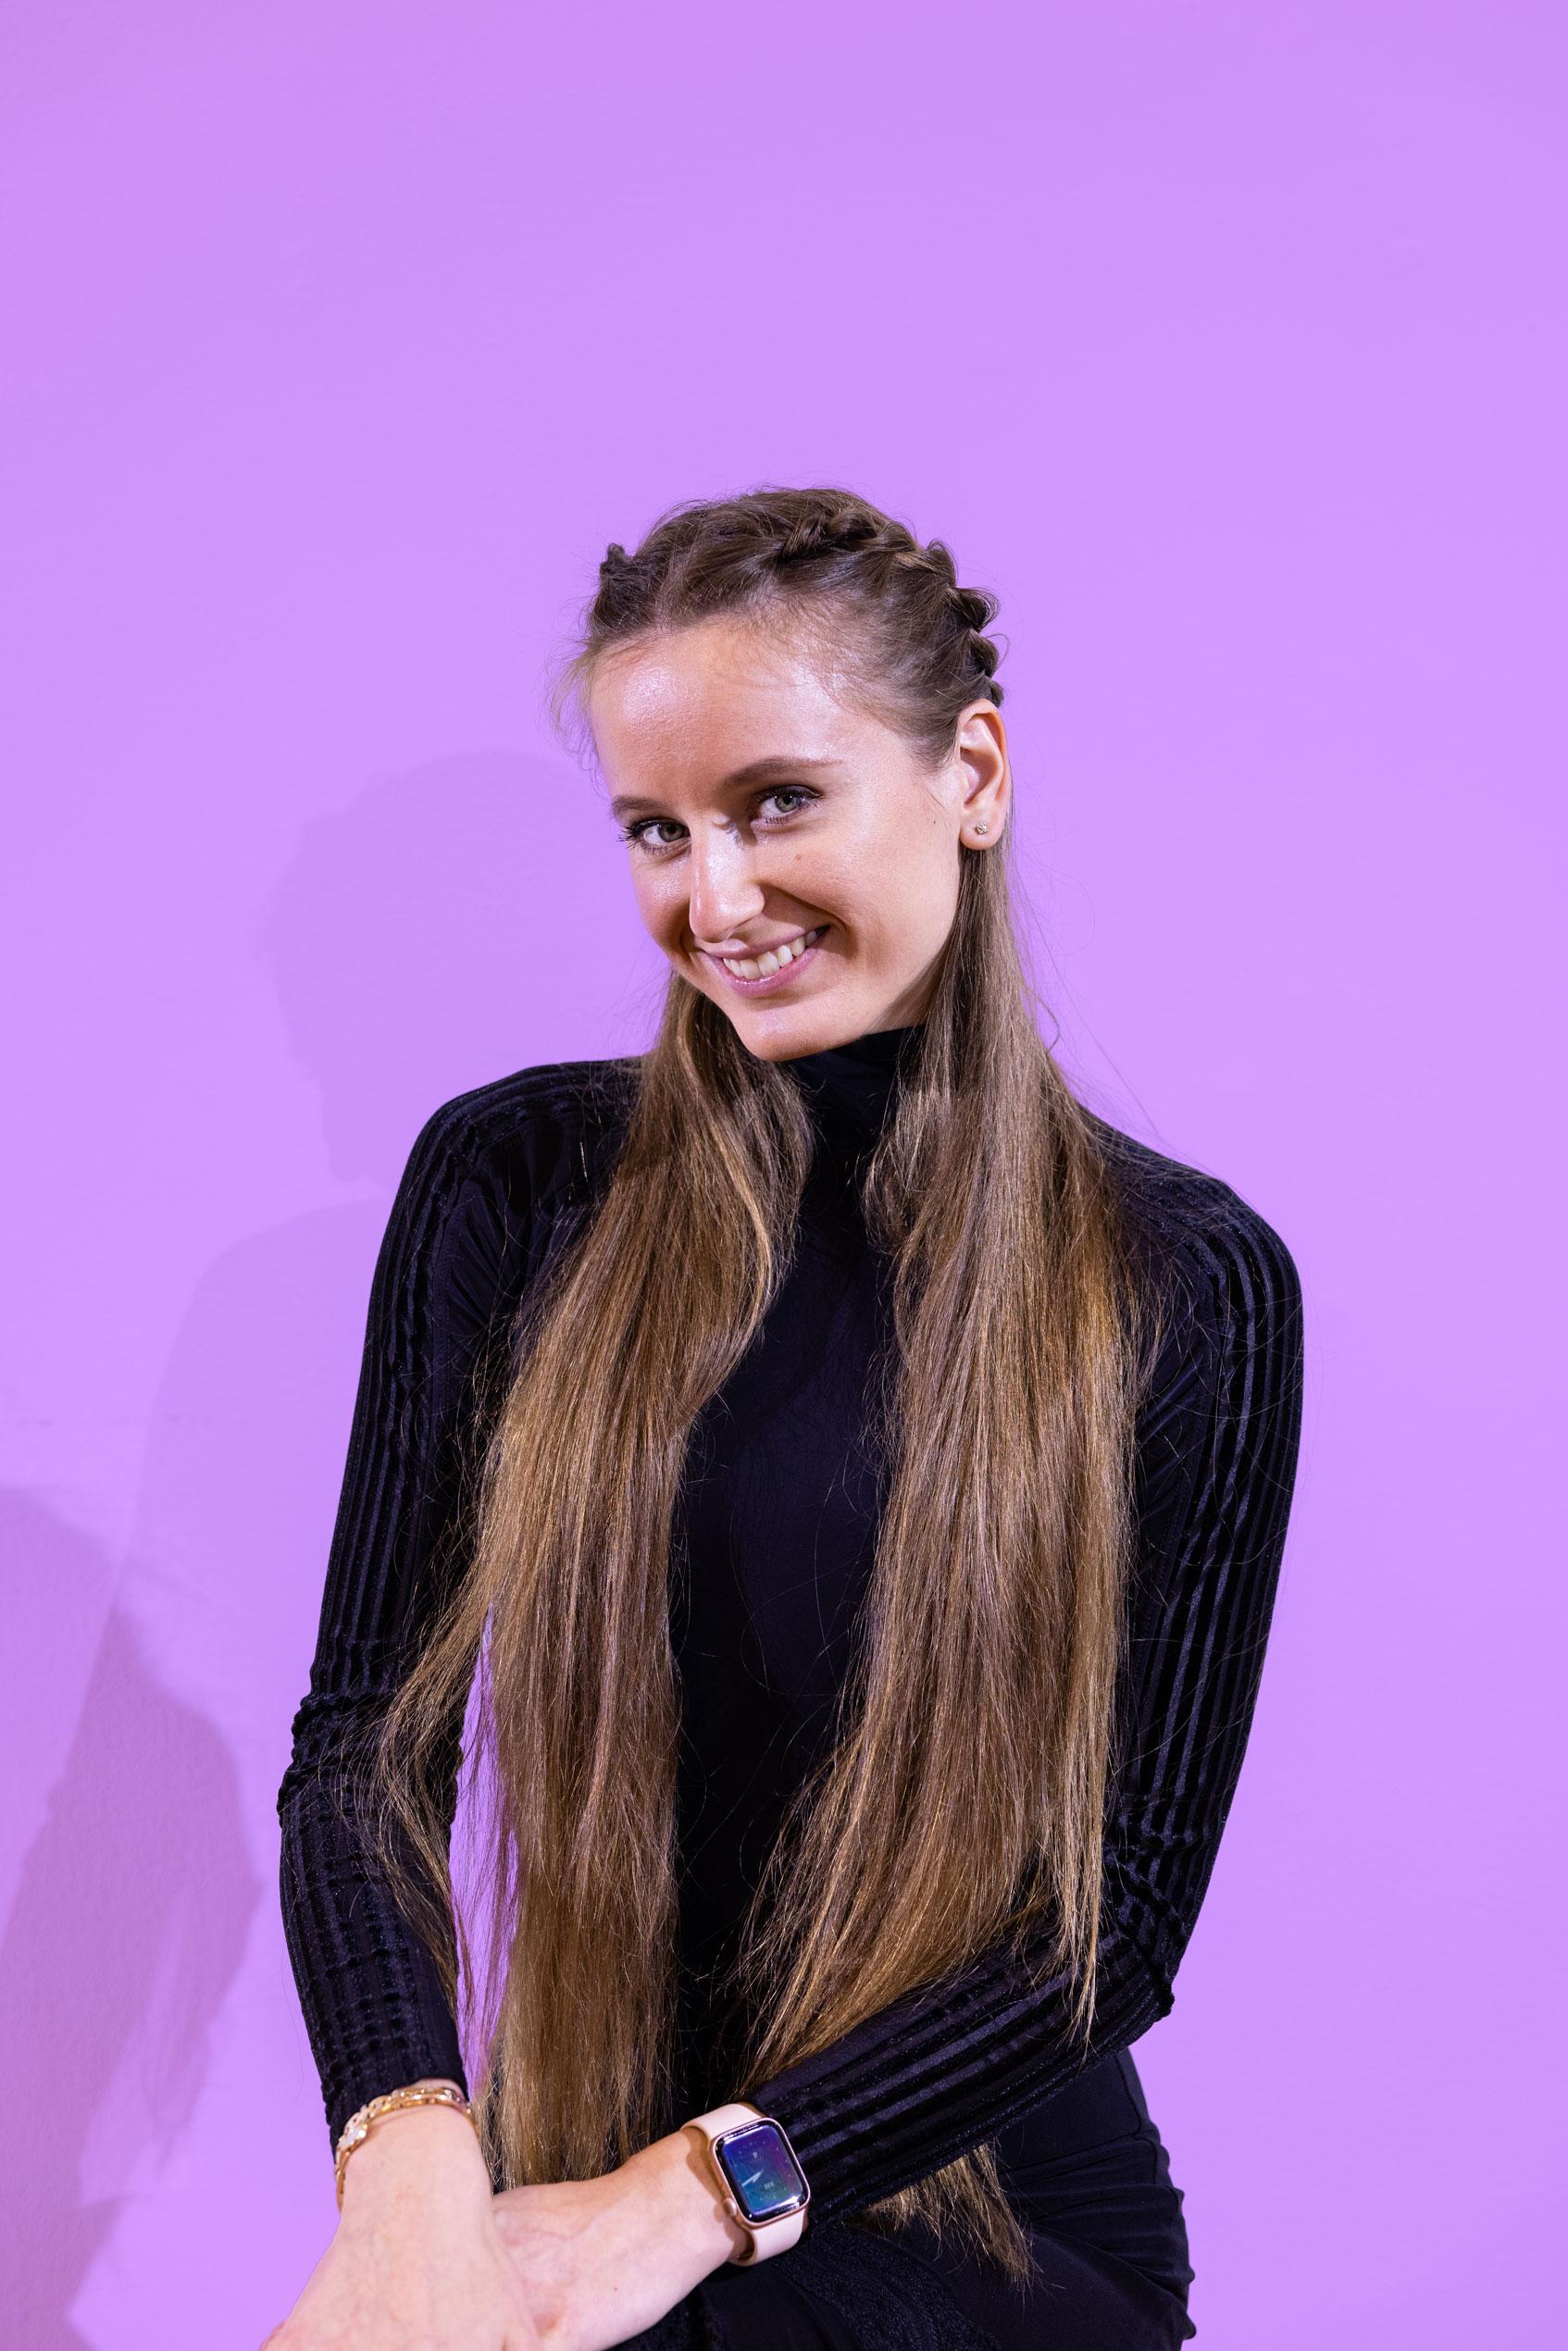 dance instructor profile picture Mariia Proskurnina